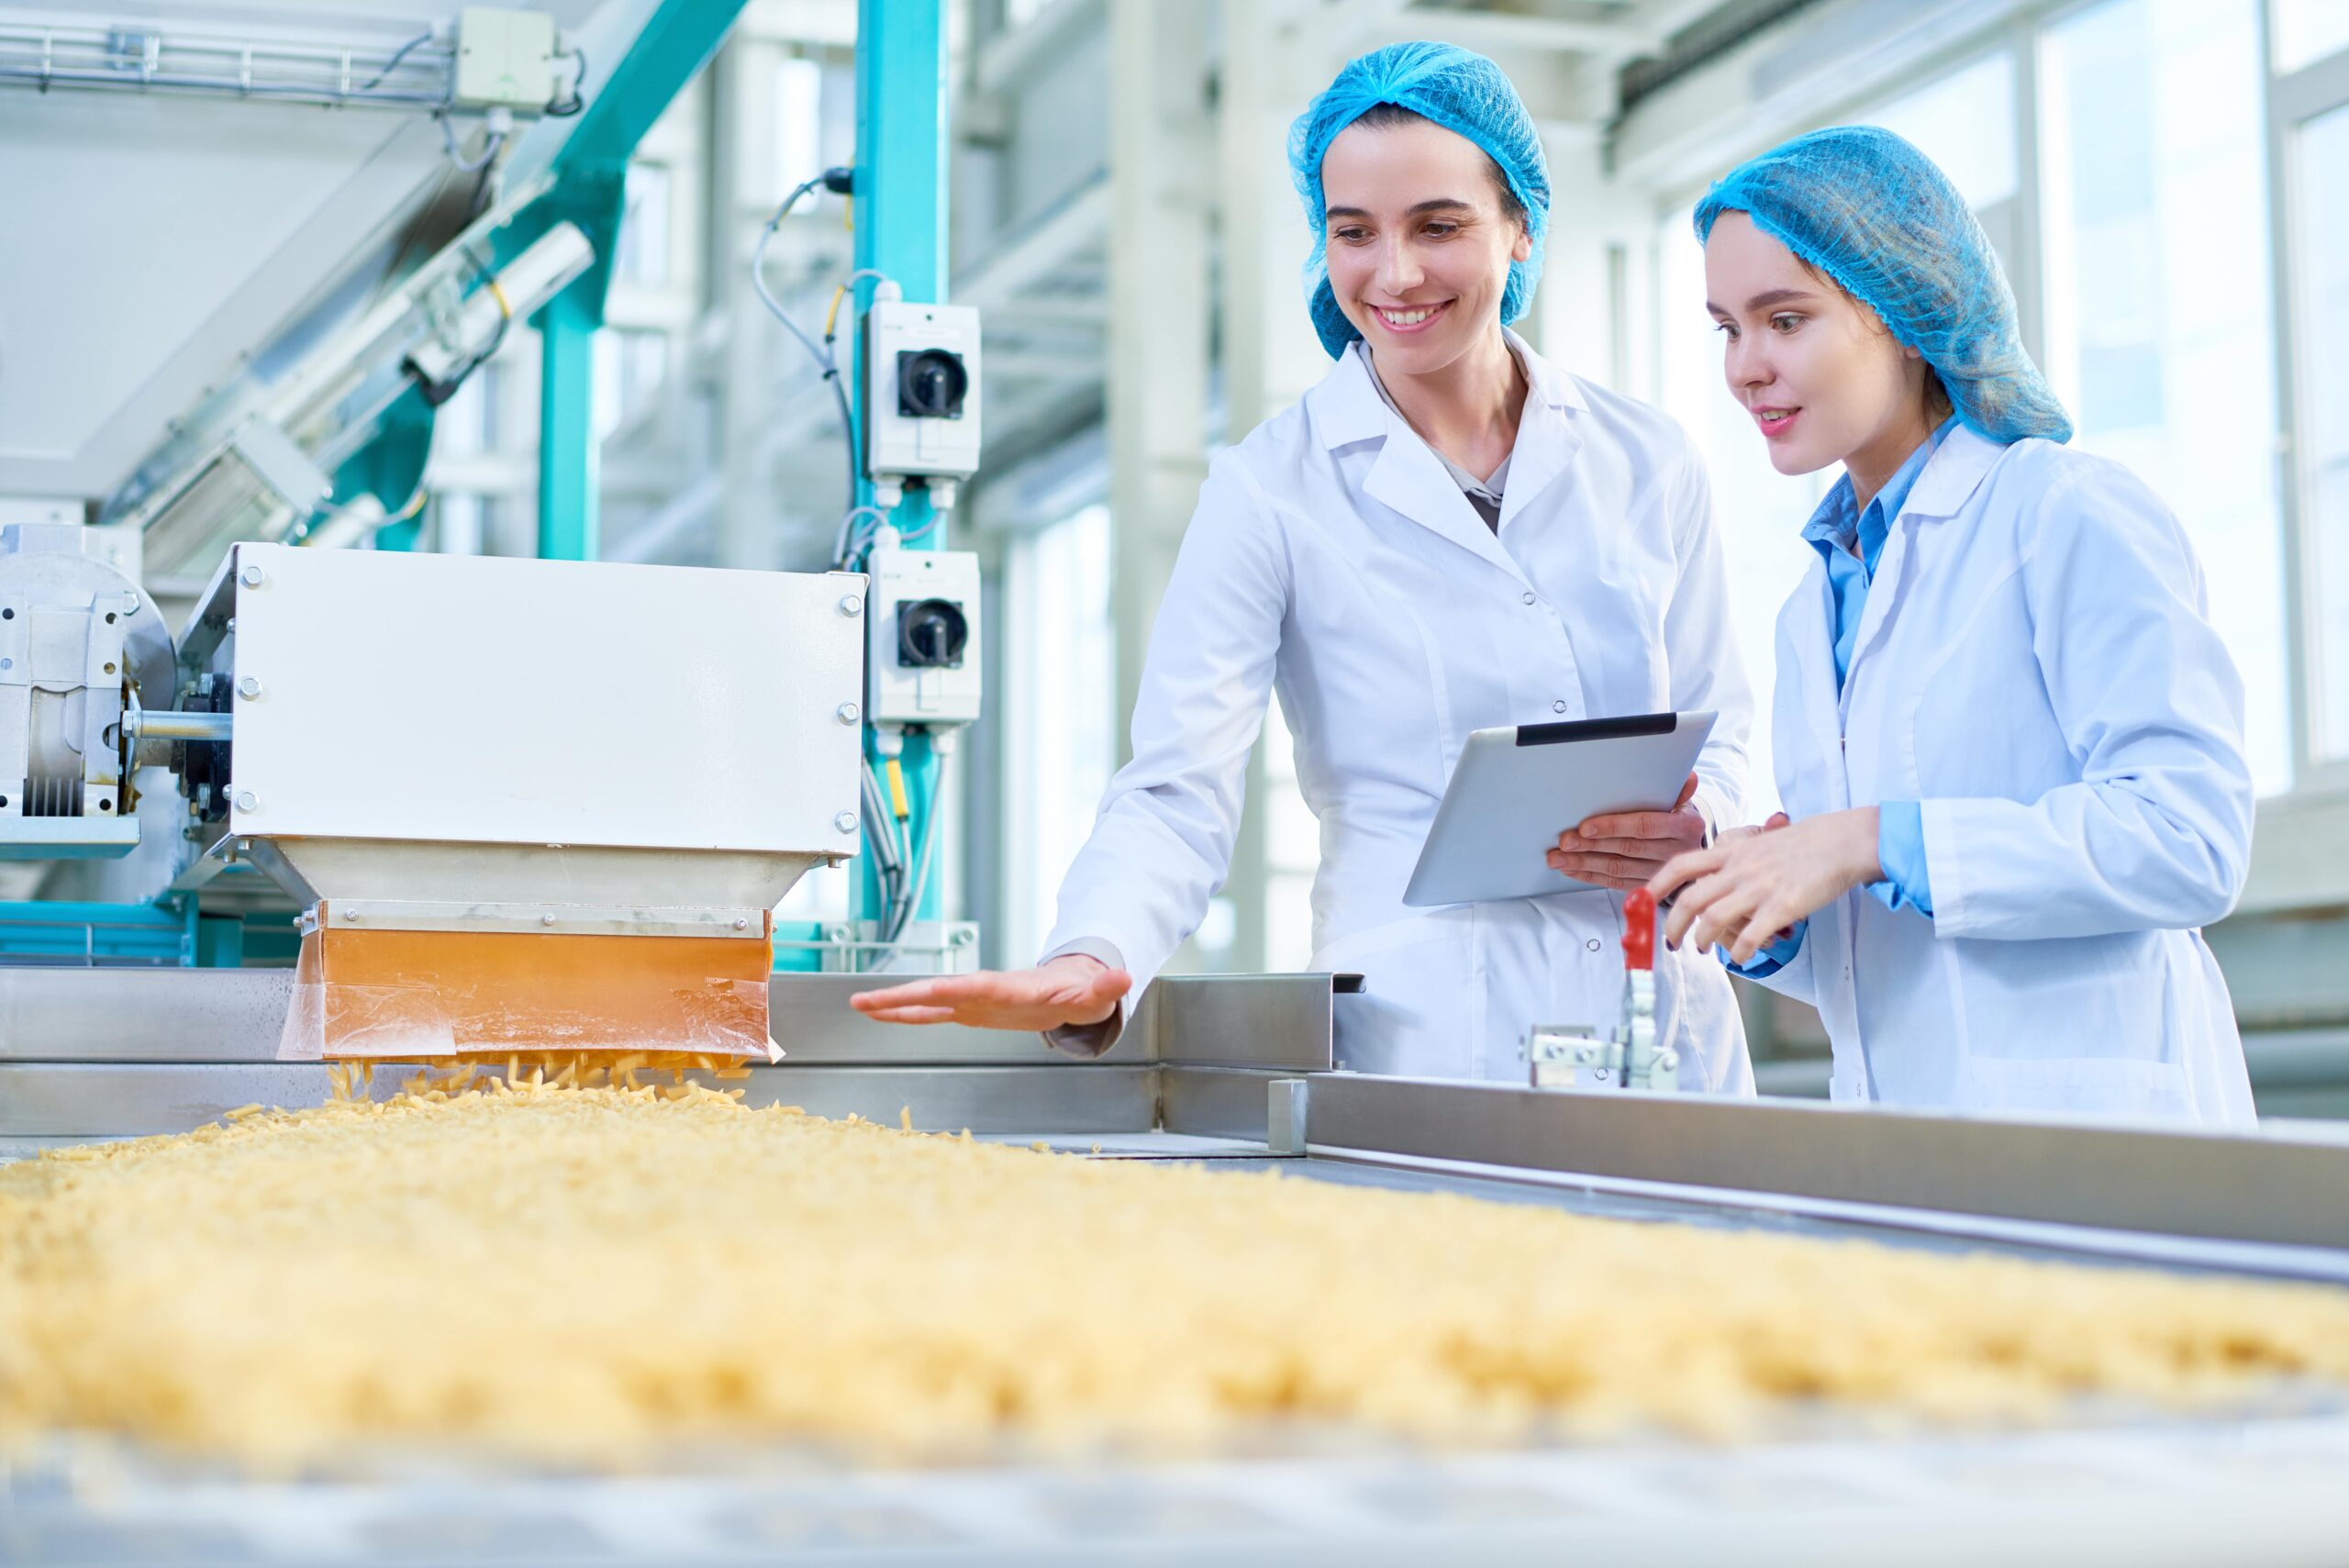 R&D Food Processing